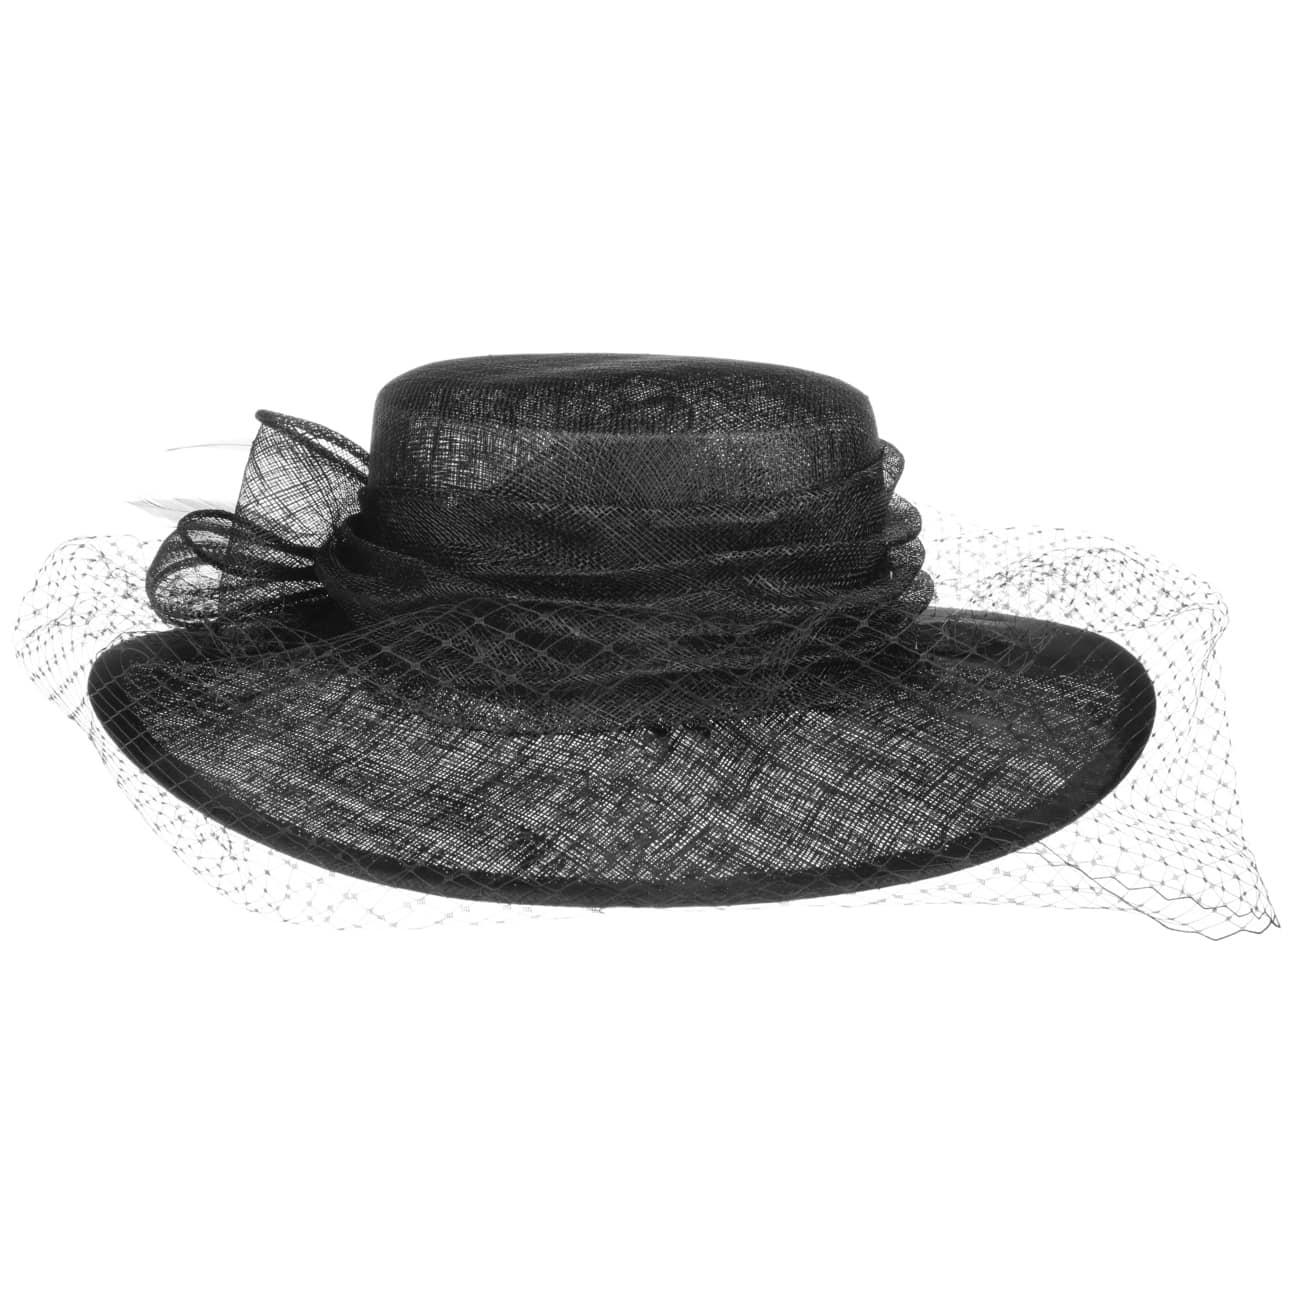 Sombrero de Mujer Matelot by McBURN